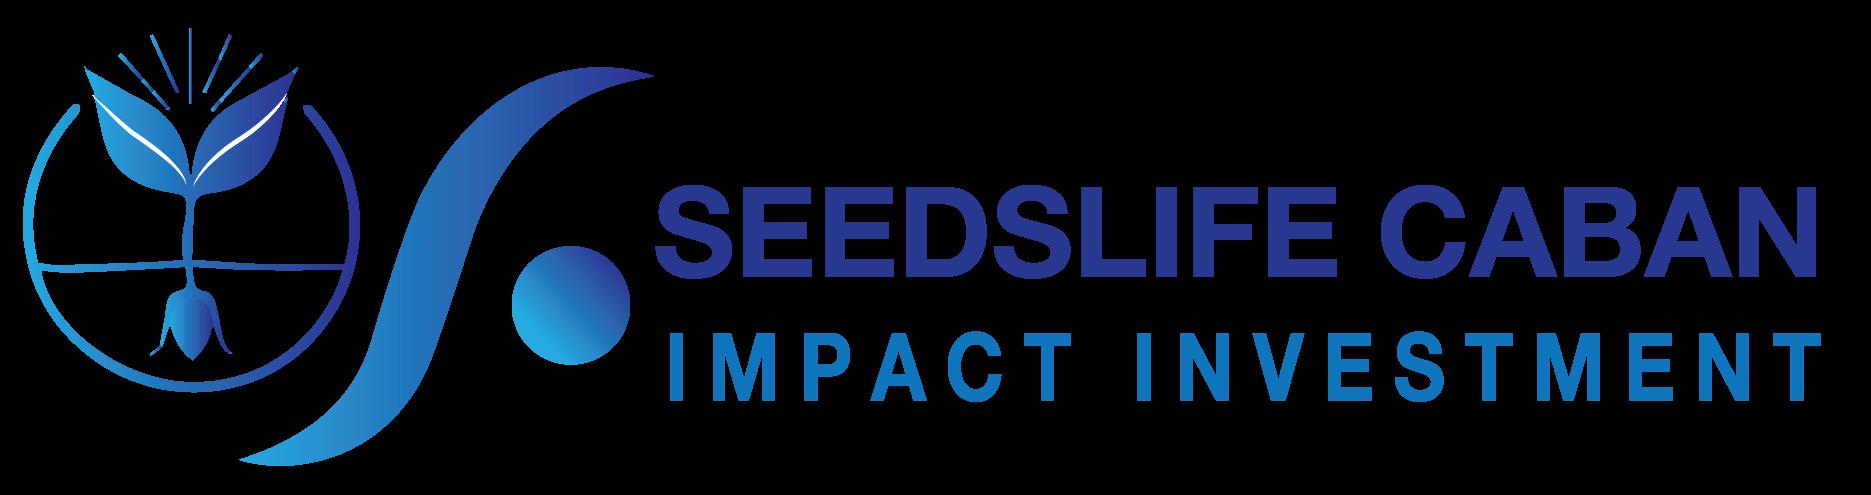 -seedlife-caban-main-logo